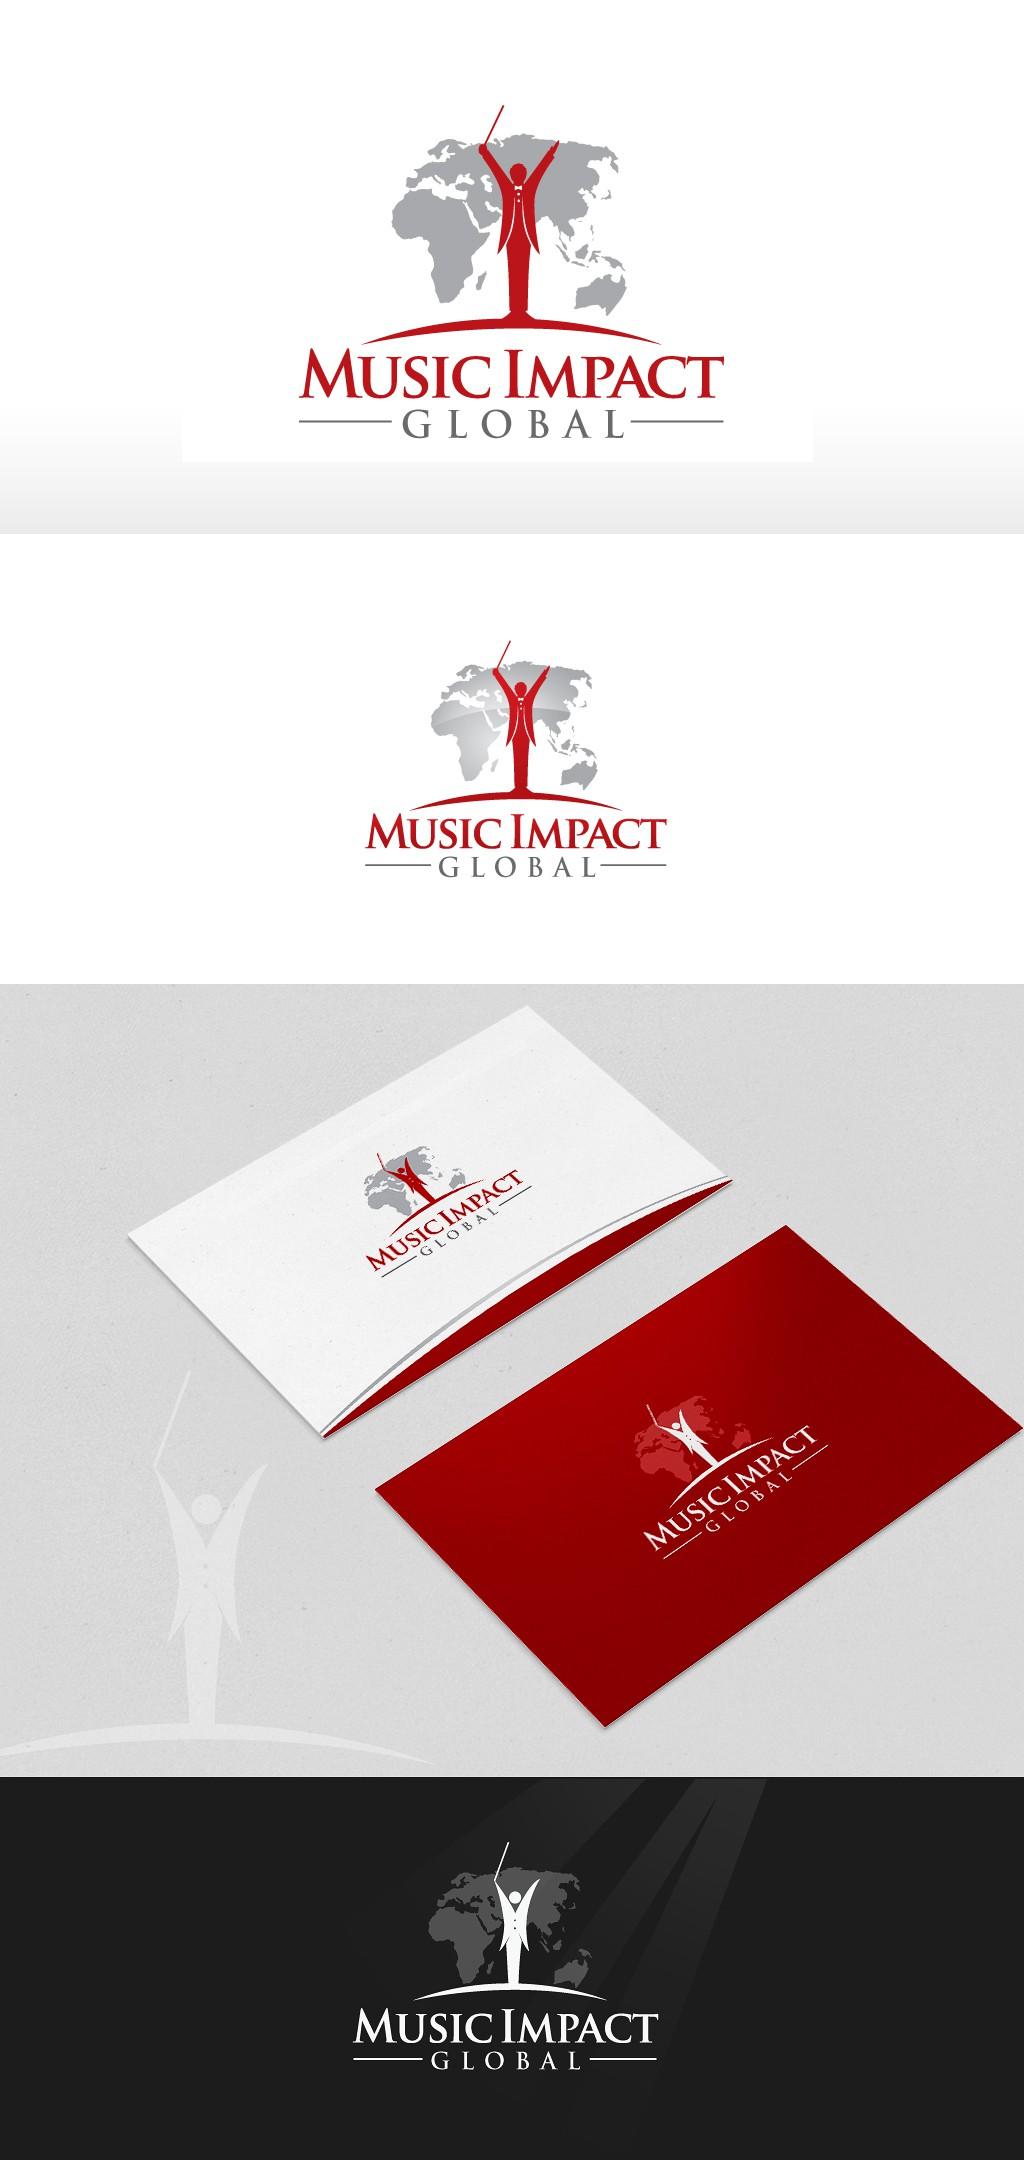 Logo creation challenge for Music Impact Global